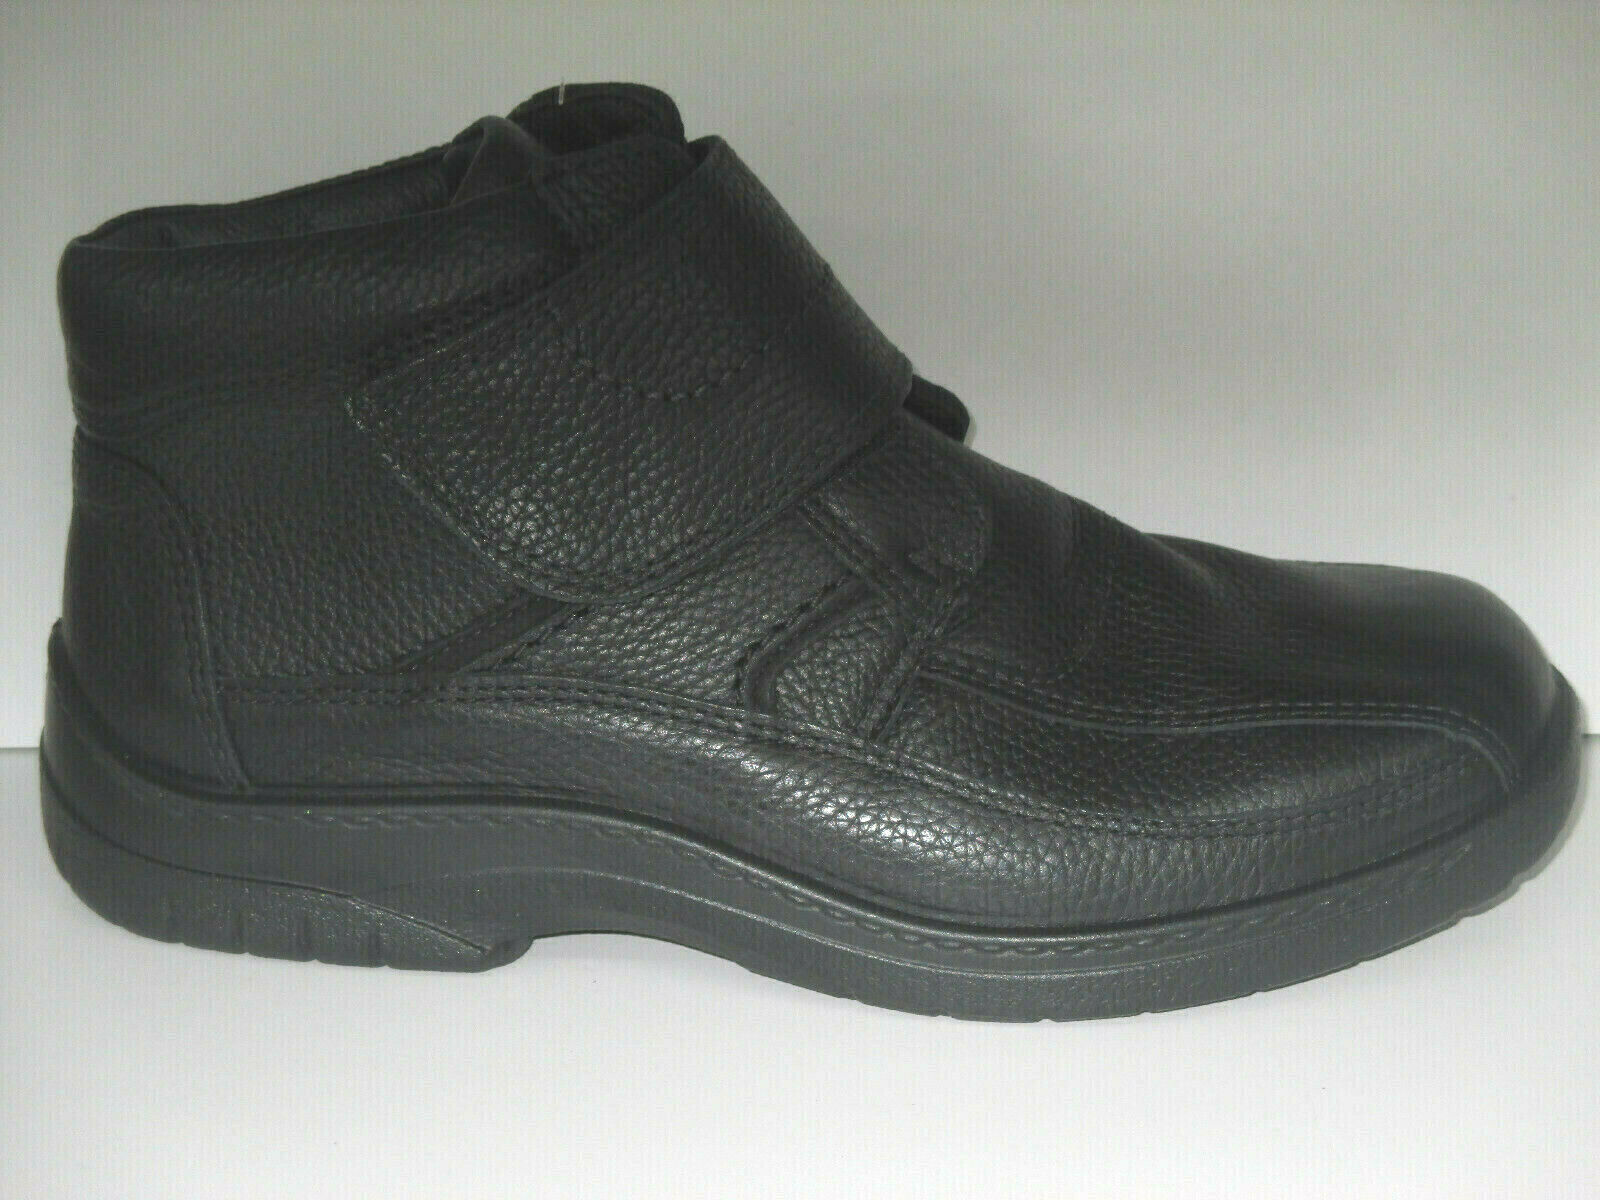 Comfortabel  Schuhe Herren Stiefelette Winterstifel, mit Lammfell Futter ++NEU++